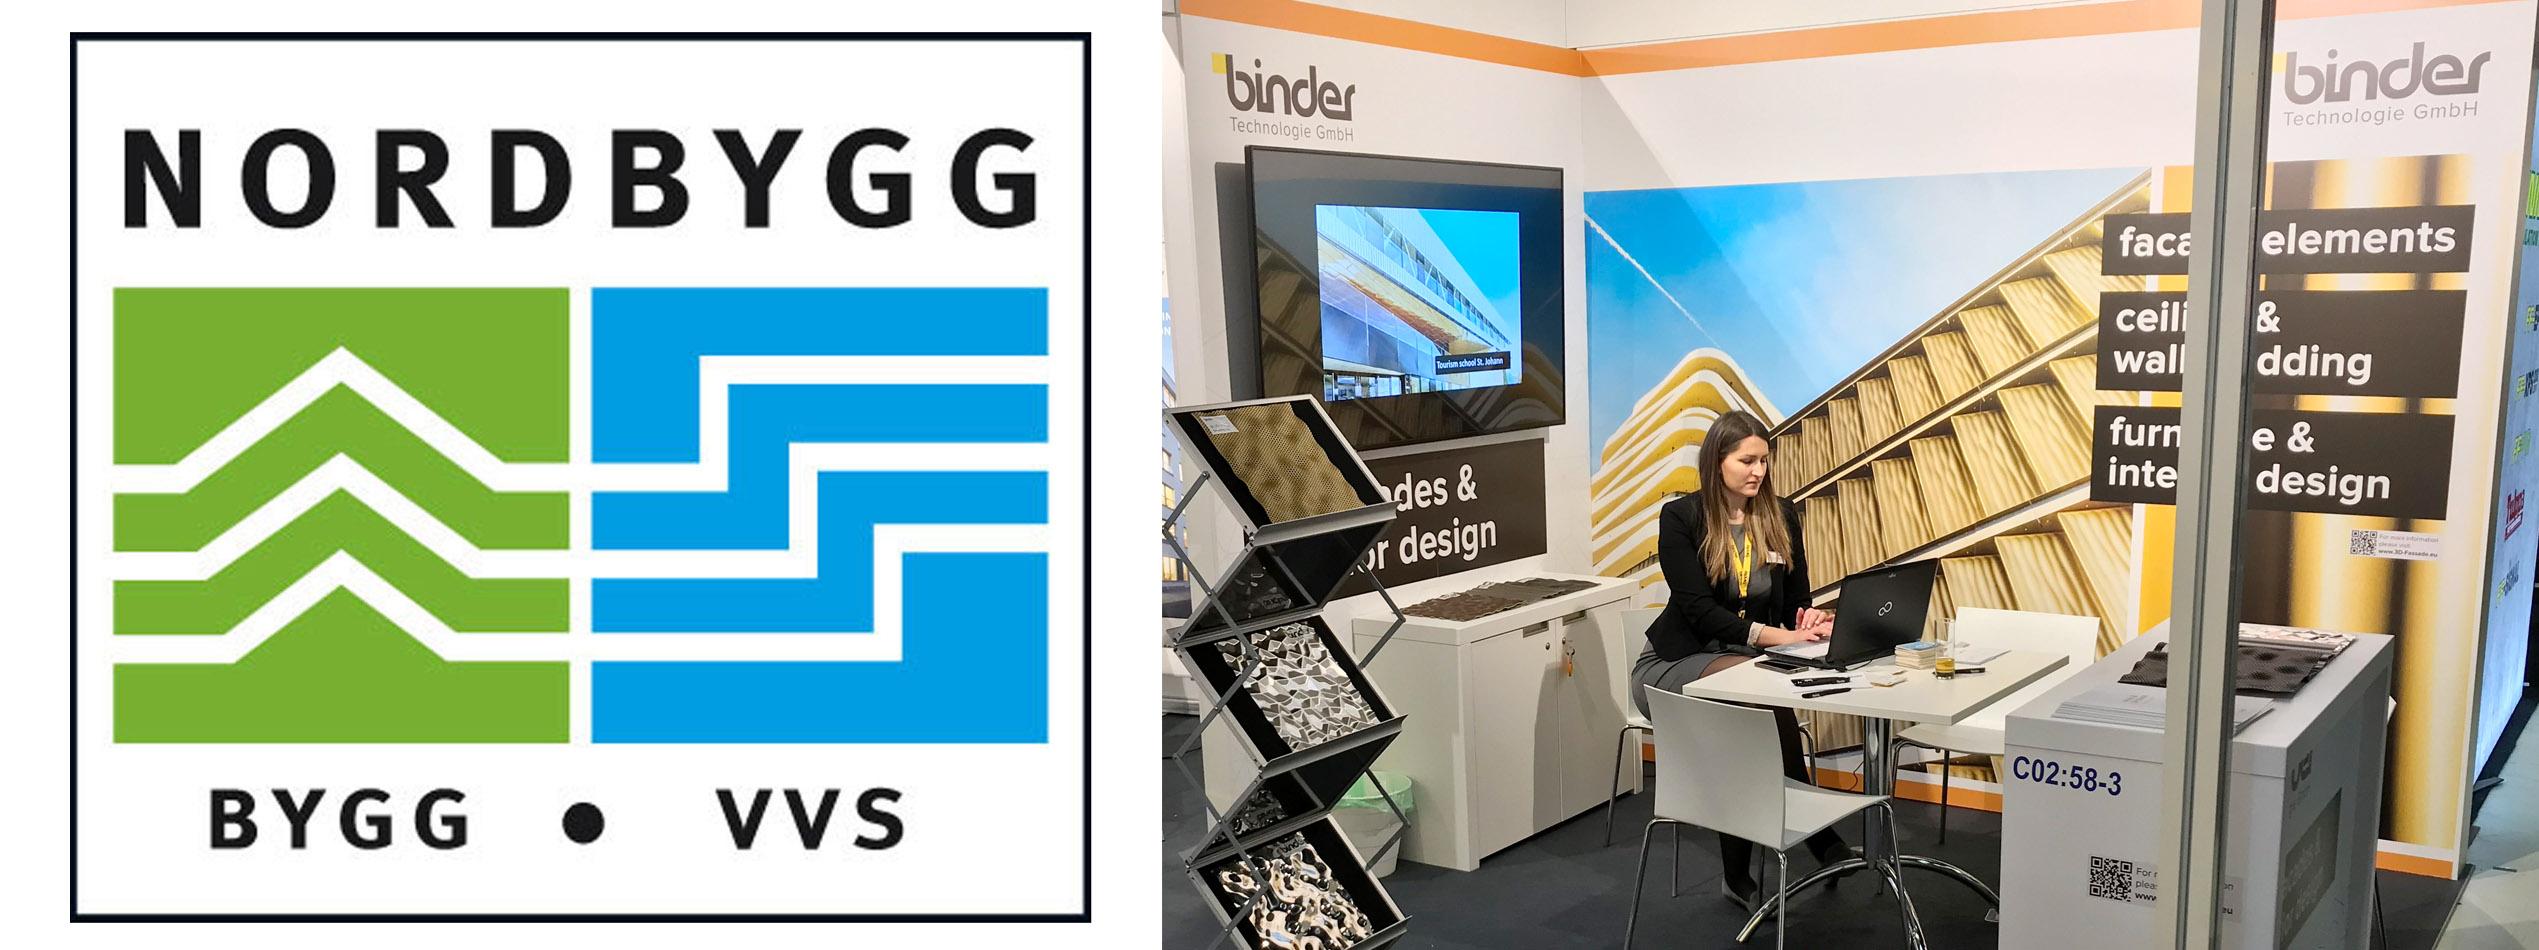 Nordbygg 2018 stockholm binder technologie gmbh for Stockholm veranstaltungen